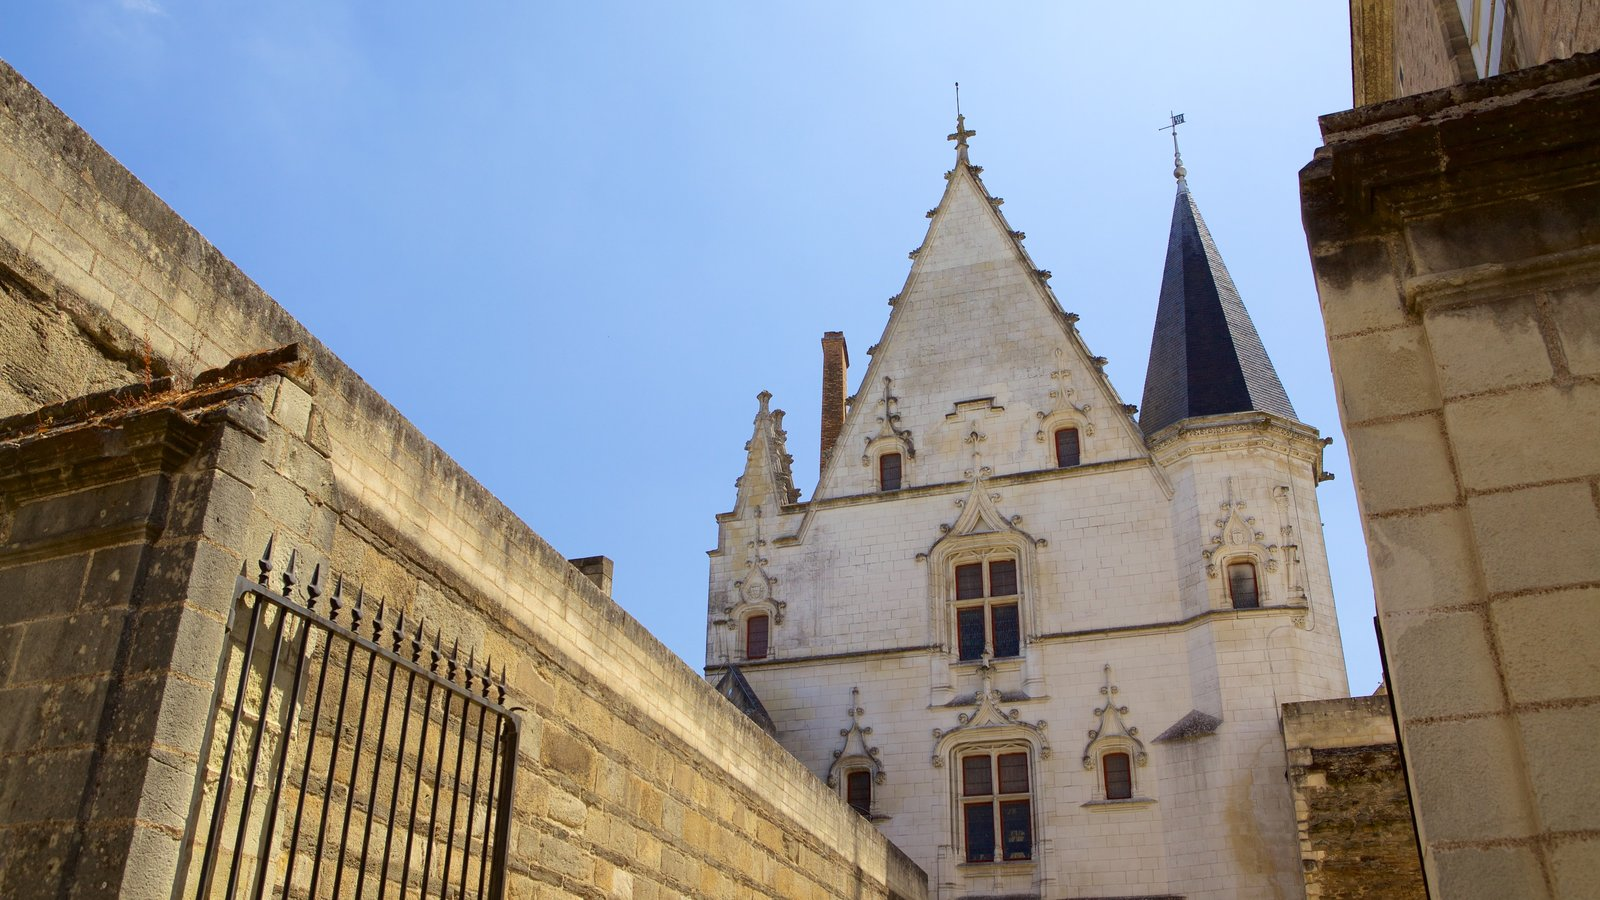 Nantes caracterizando elementos de patrimônio e arquitetura de patrimônio